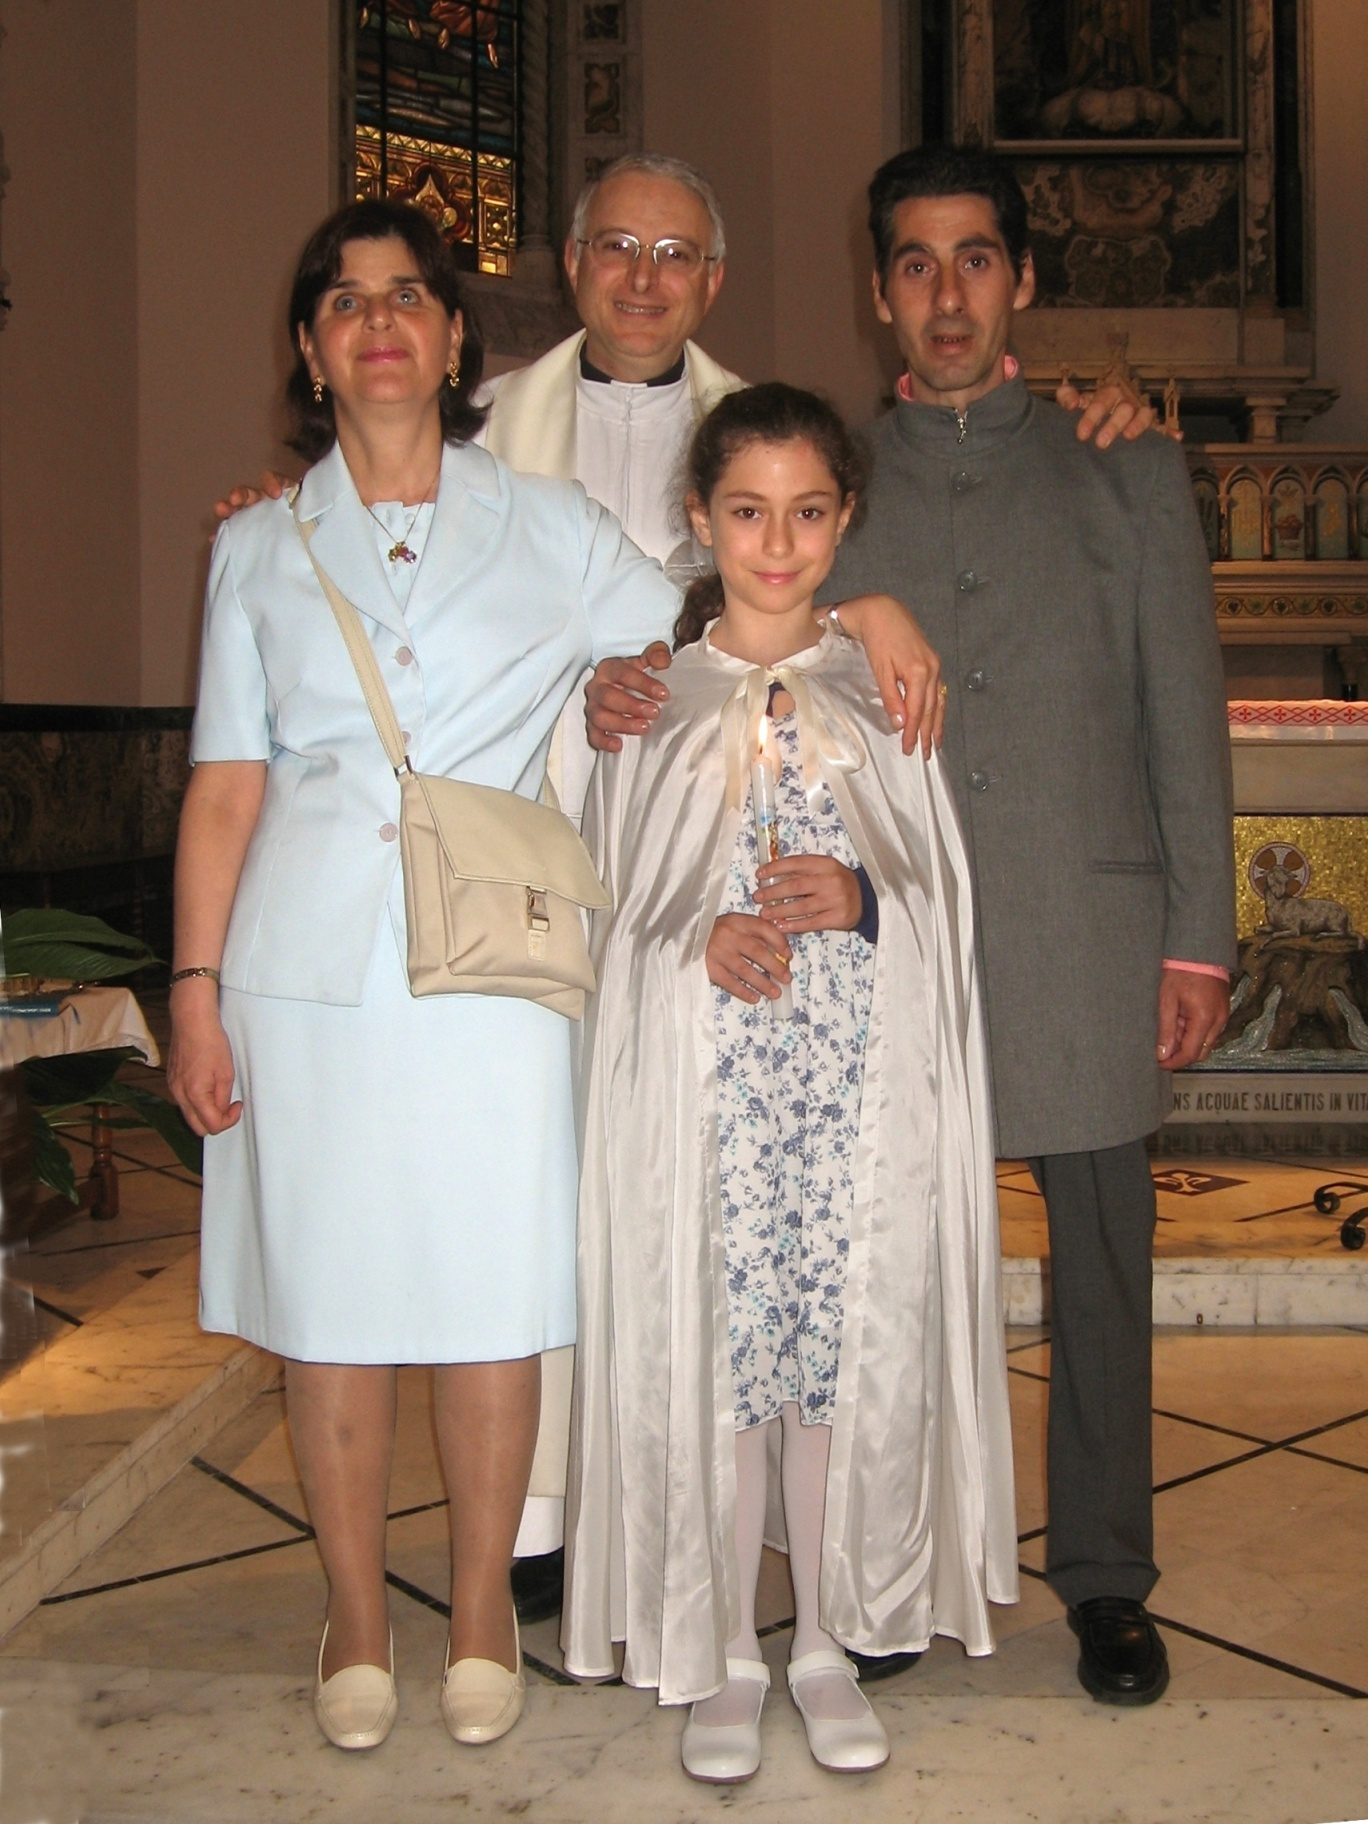 Battesimo_Jasmine_Romagnolo_10-05-22--11.29.34